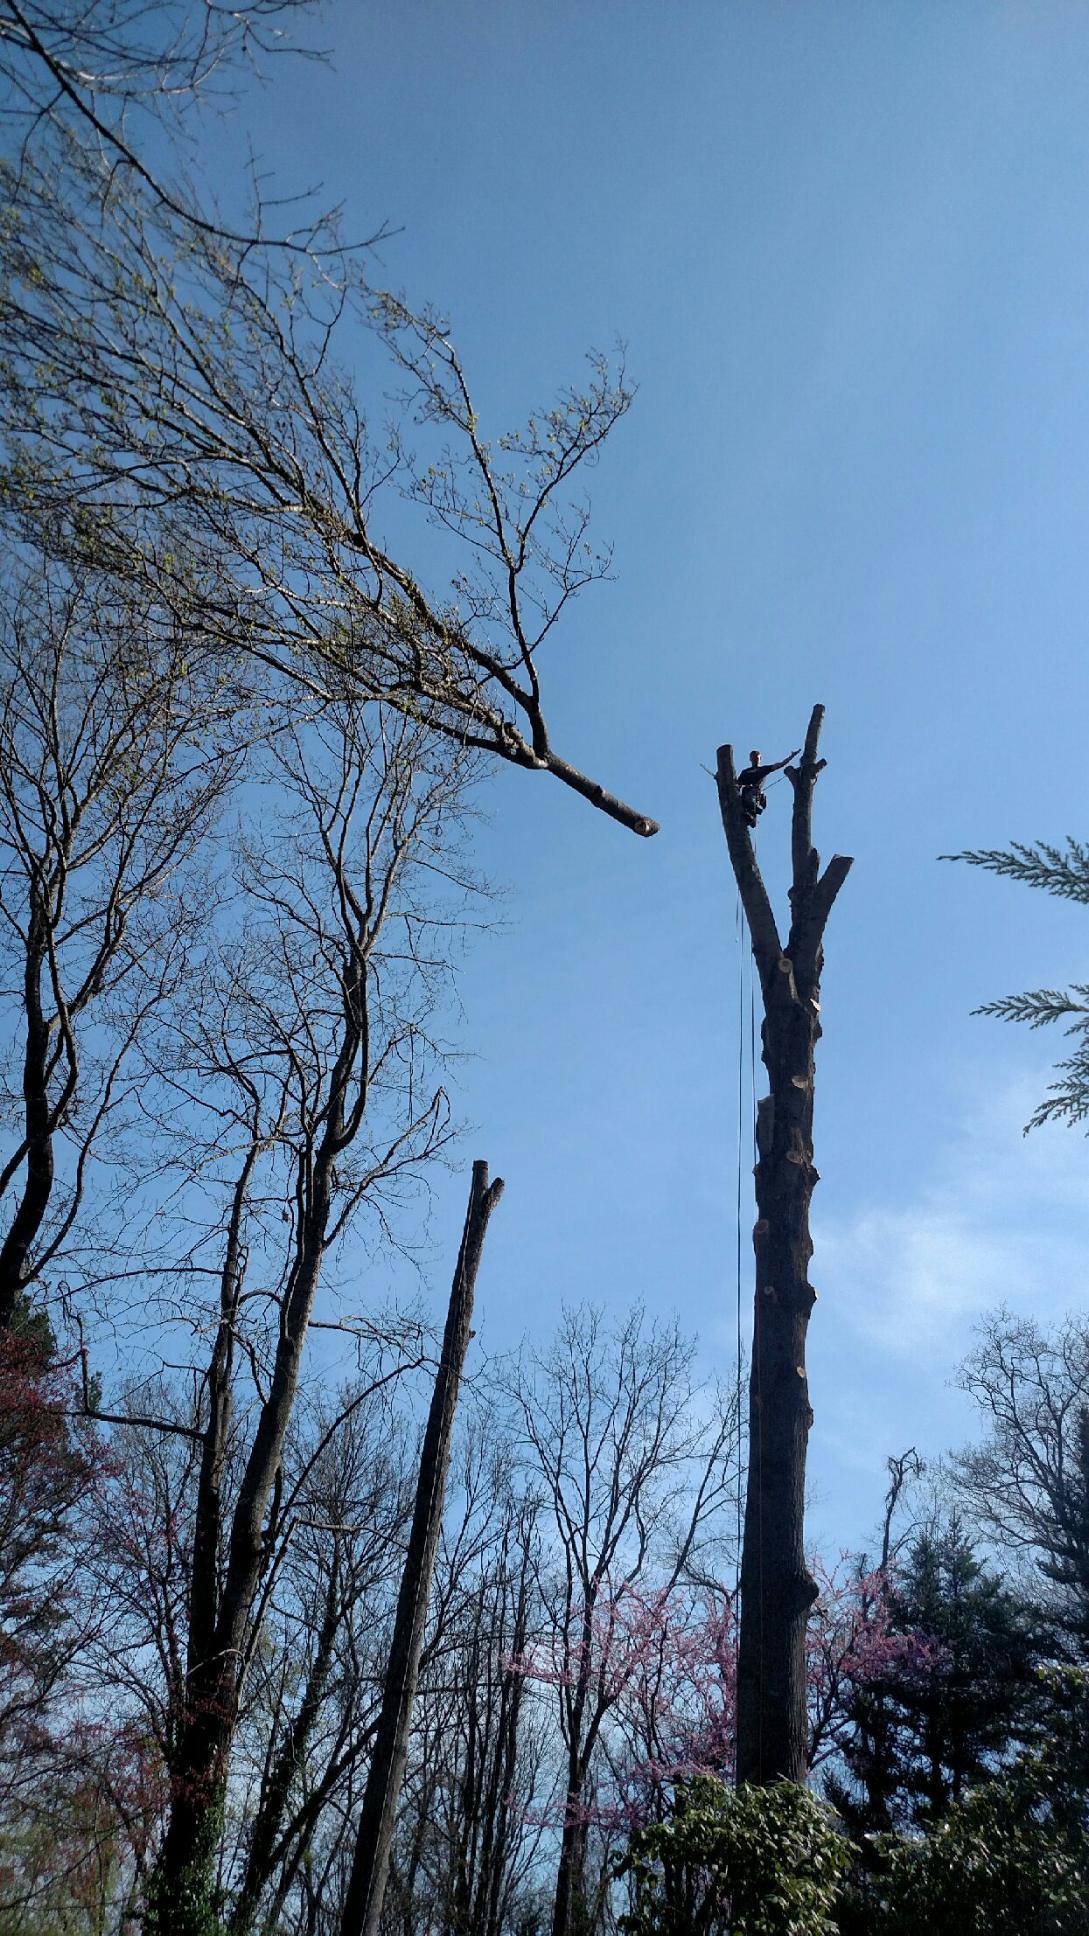 tree-removal-large-tree.JPG